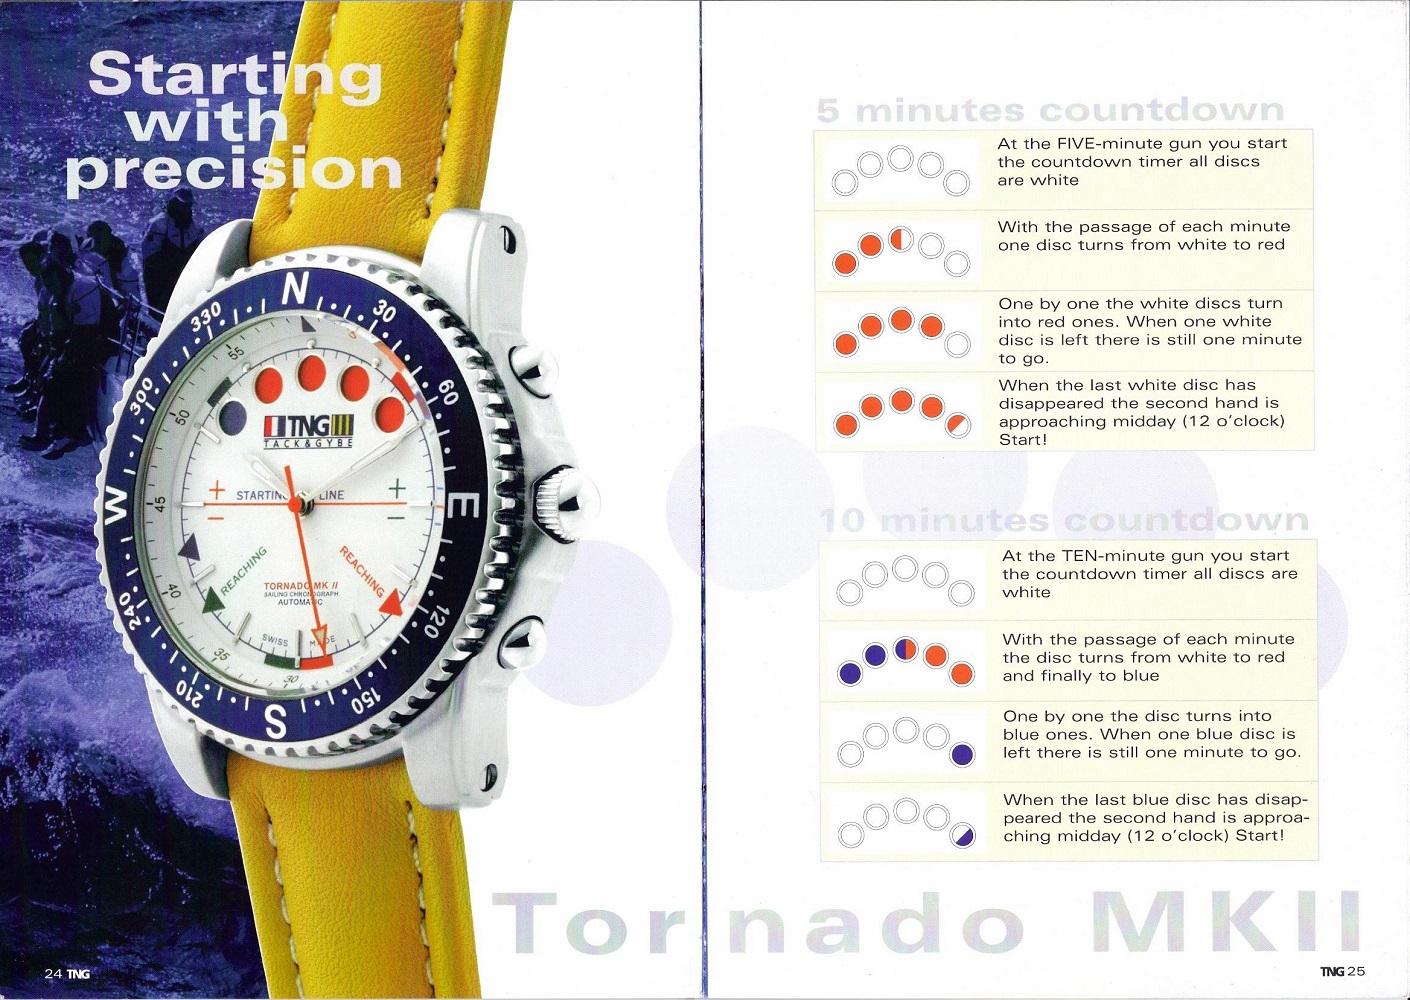 TNG_TornadoMk3